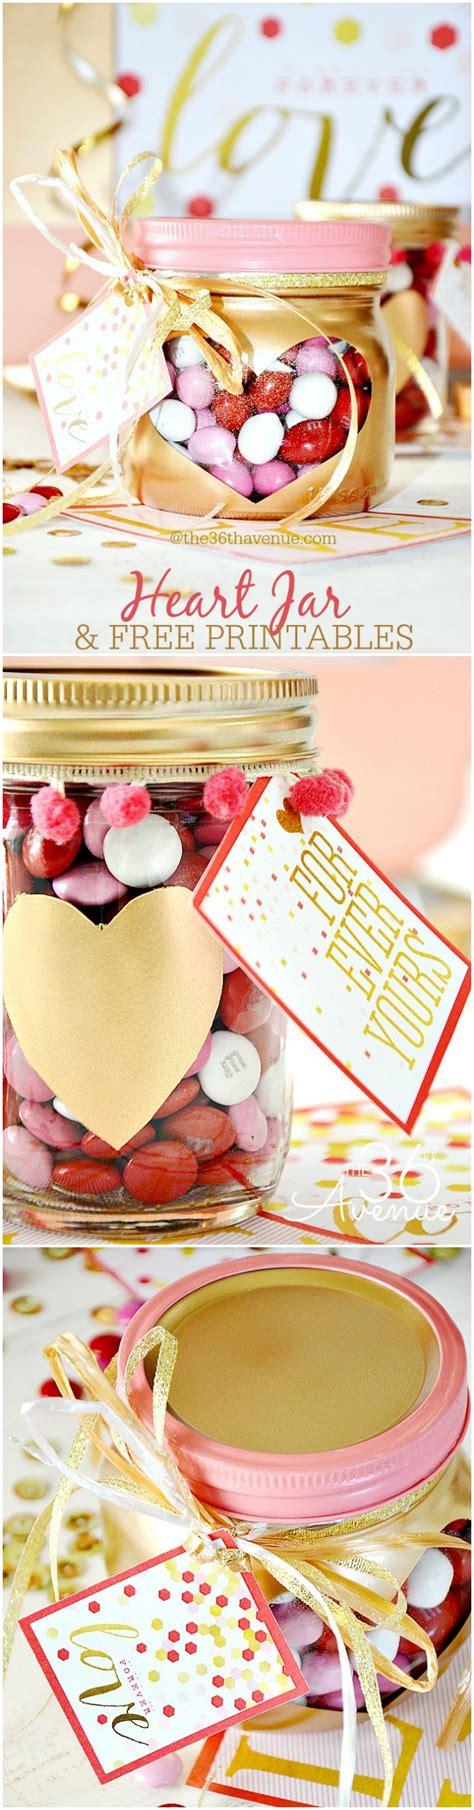 adorable valentine gift ideas the 36th avenue the 36th avenue valentine s day gift heart jars the